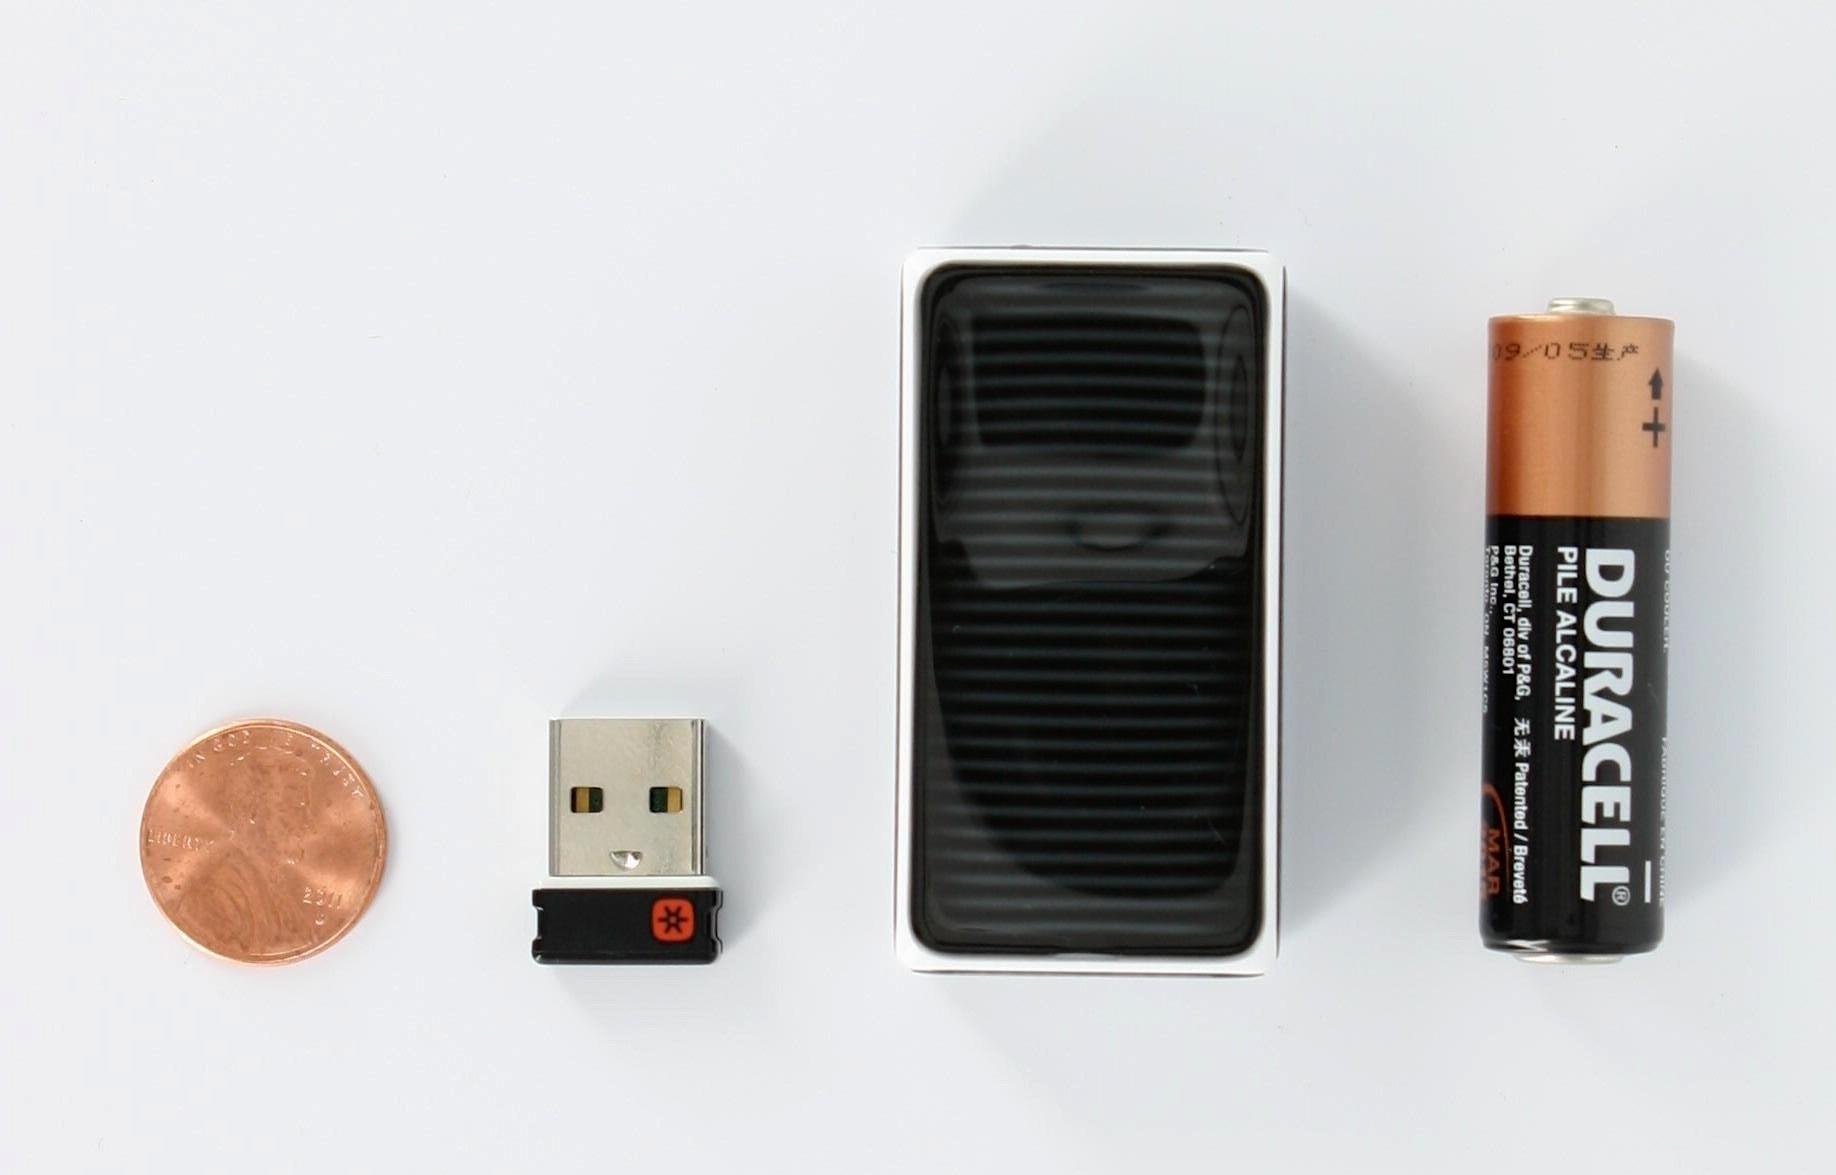 8444e754c61 The Computer Mouse That Leaves an Impression | logi BLOG